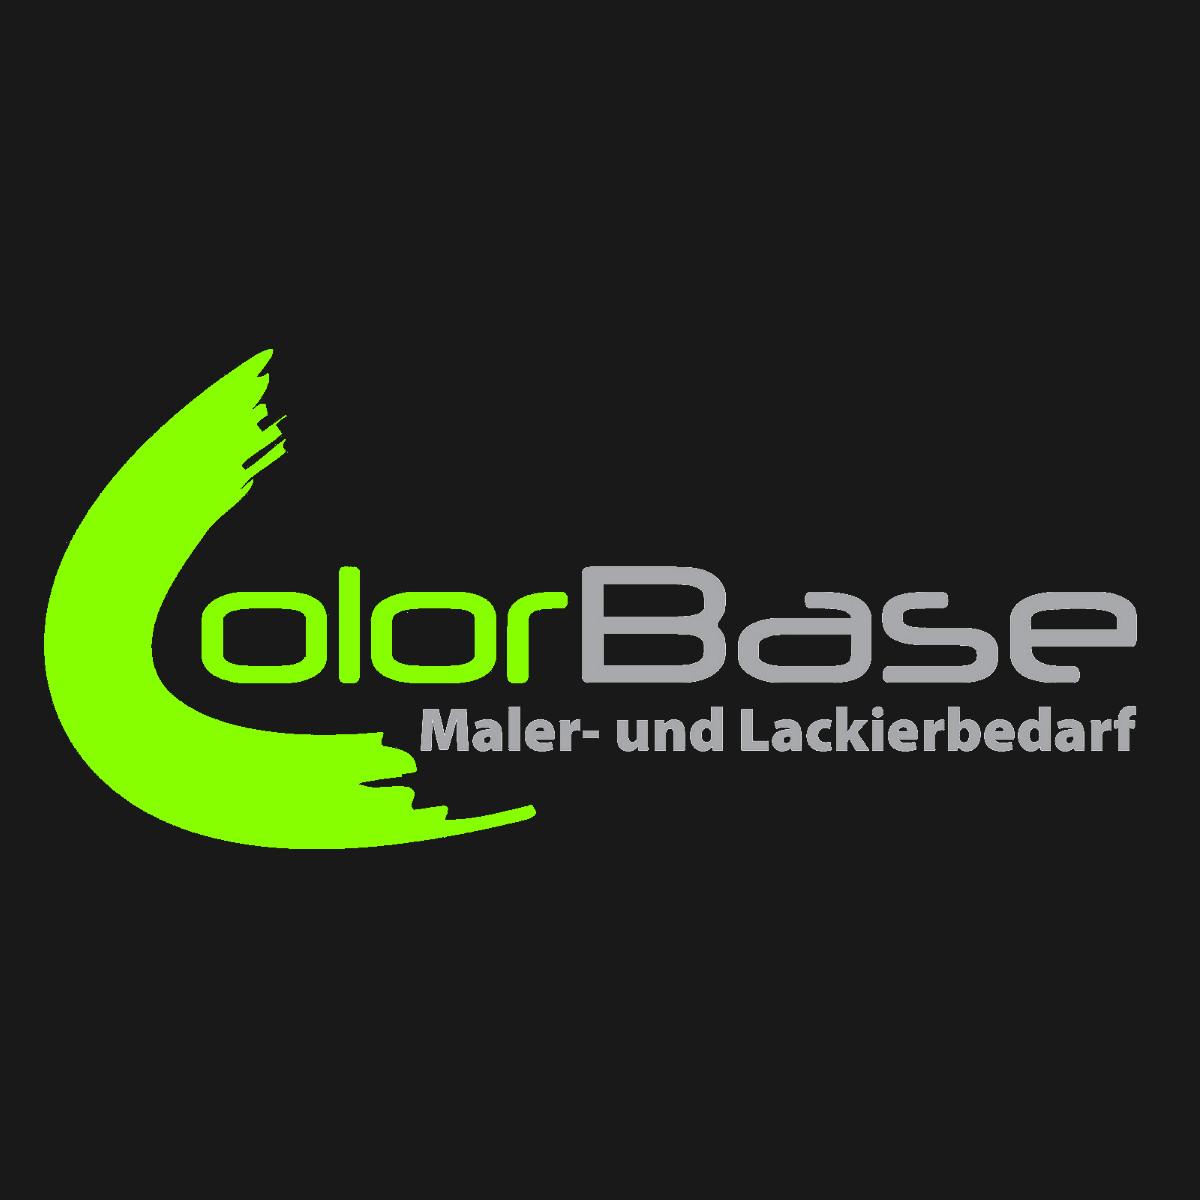 ColorBase Maler- & Lackierbedarf